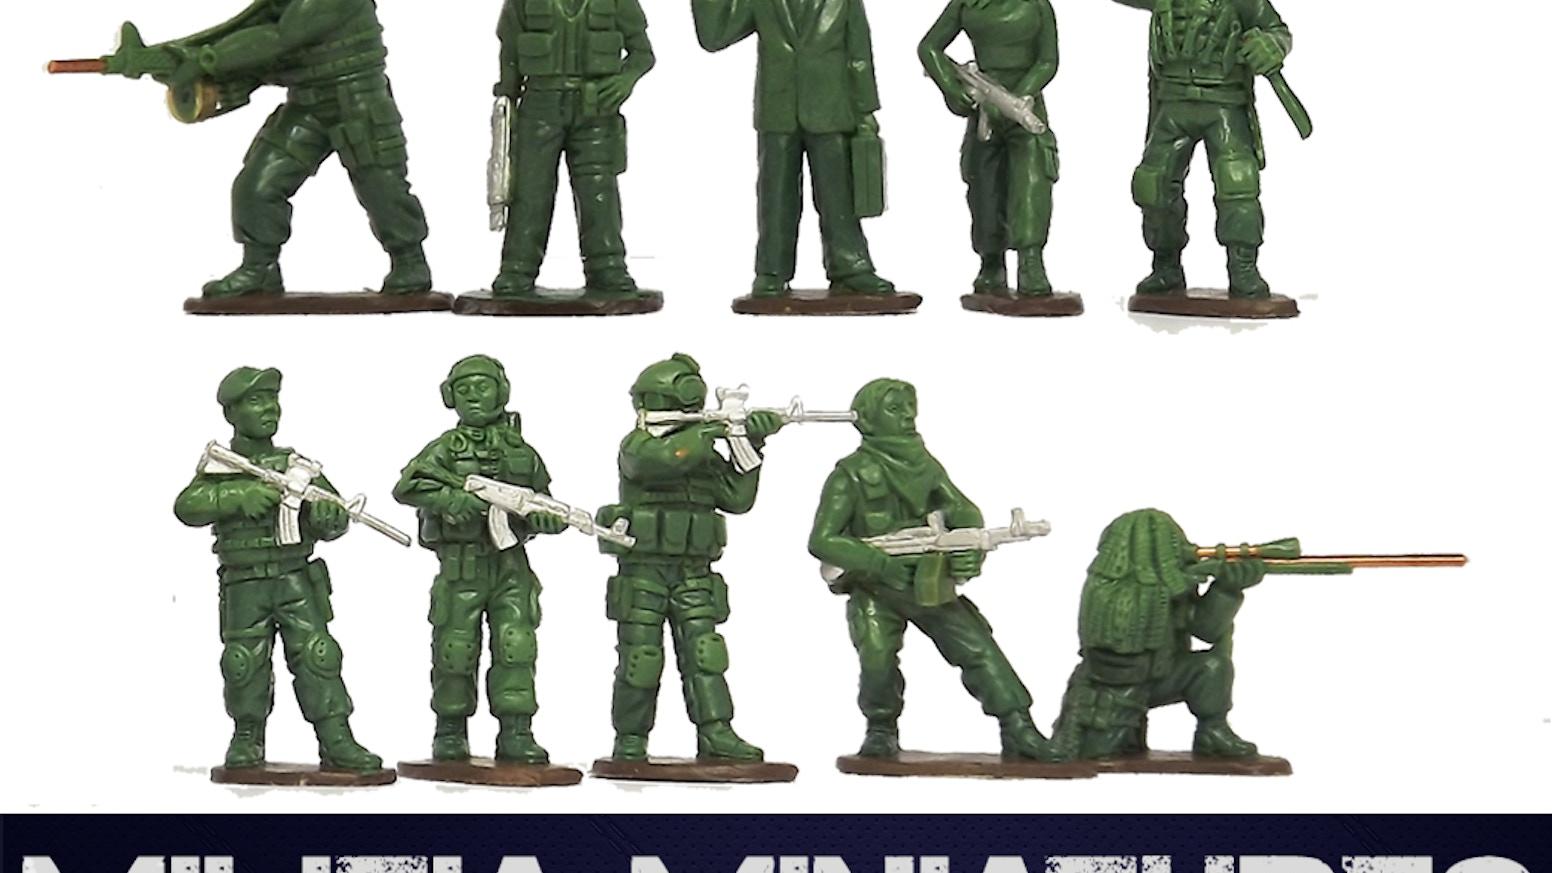 Militia Miniatures - 28mm Modern Mercenaries! by Leon Pengilley